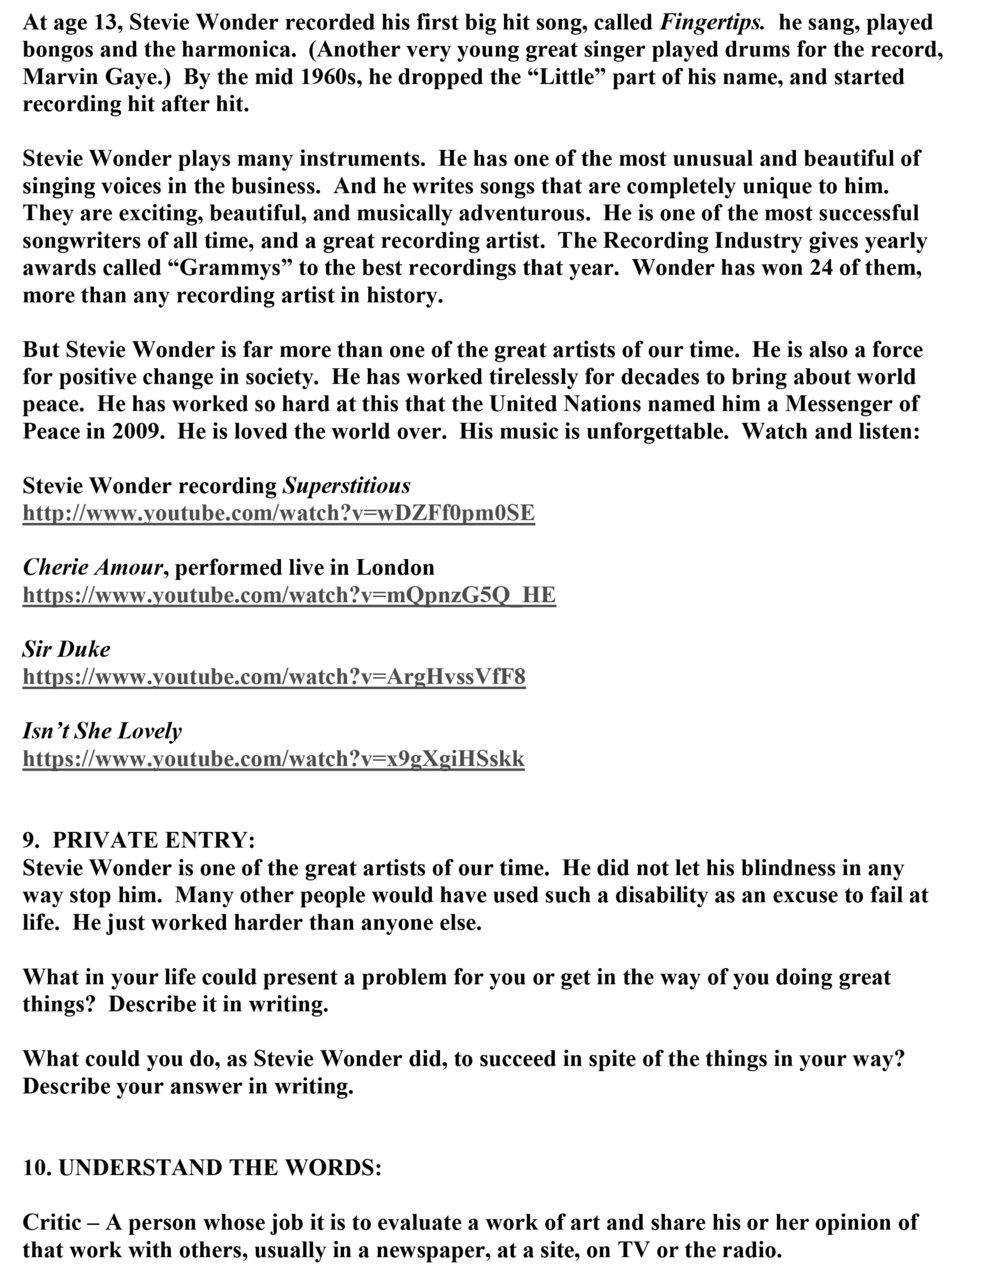 May 13 pg 3 sample.jpg